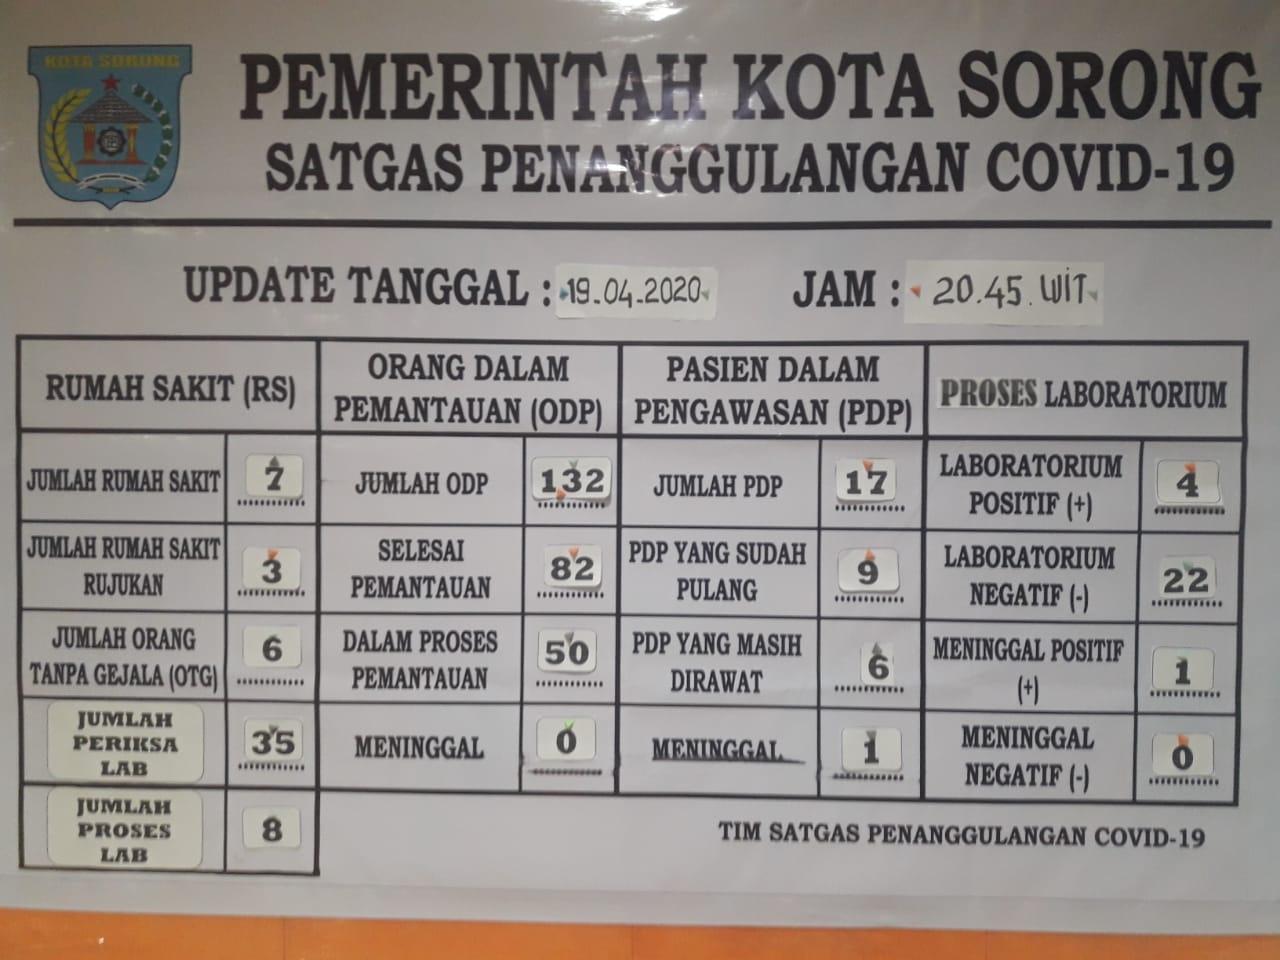 Warga Patut Waspada, Kota Sorong Jadi Transmisi Lokal Covid-19 4 IMG 20200420 WA0005 1